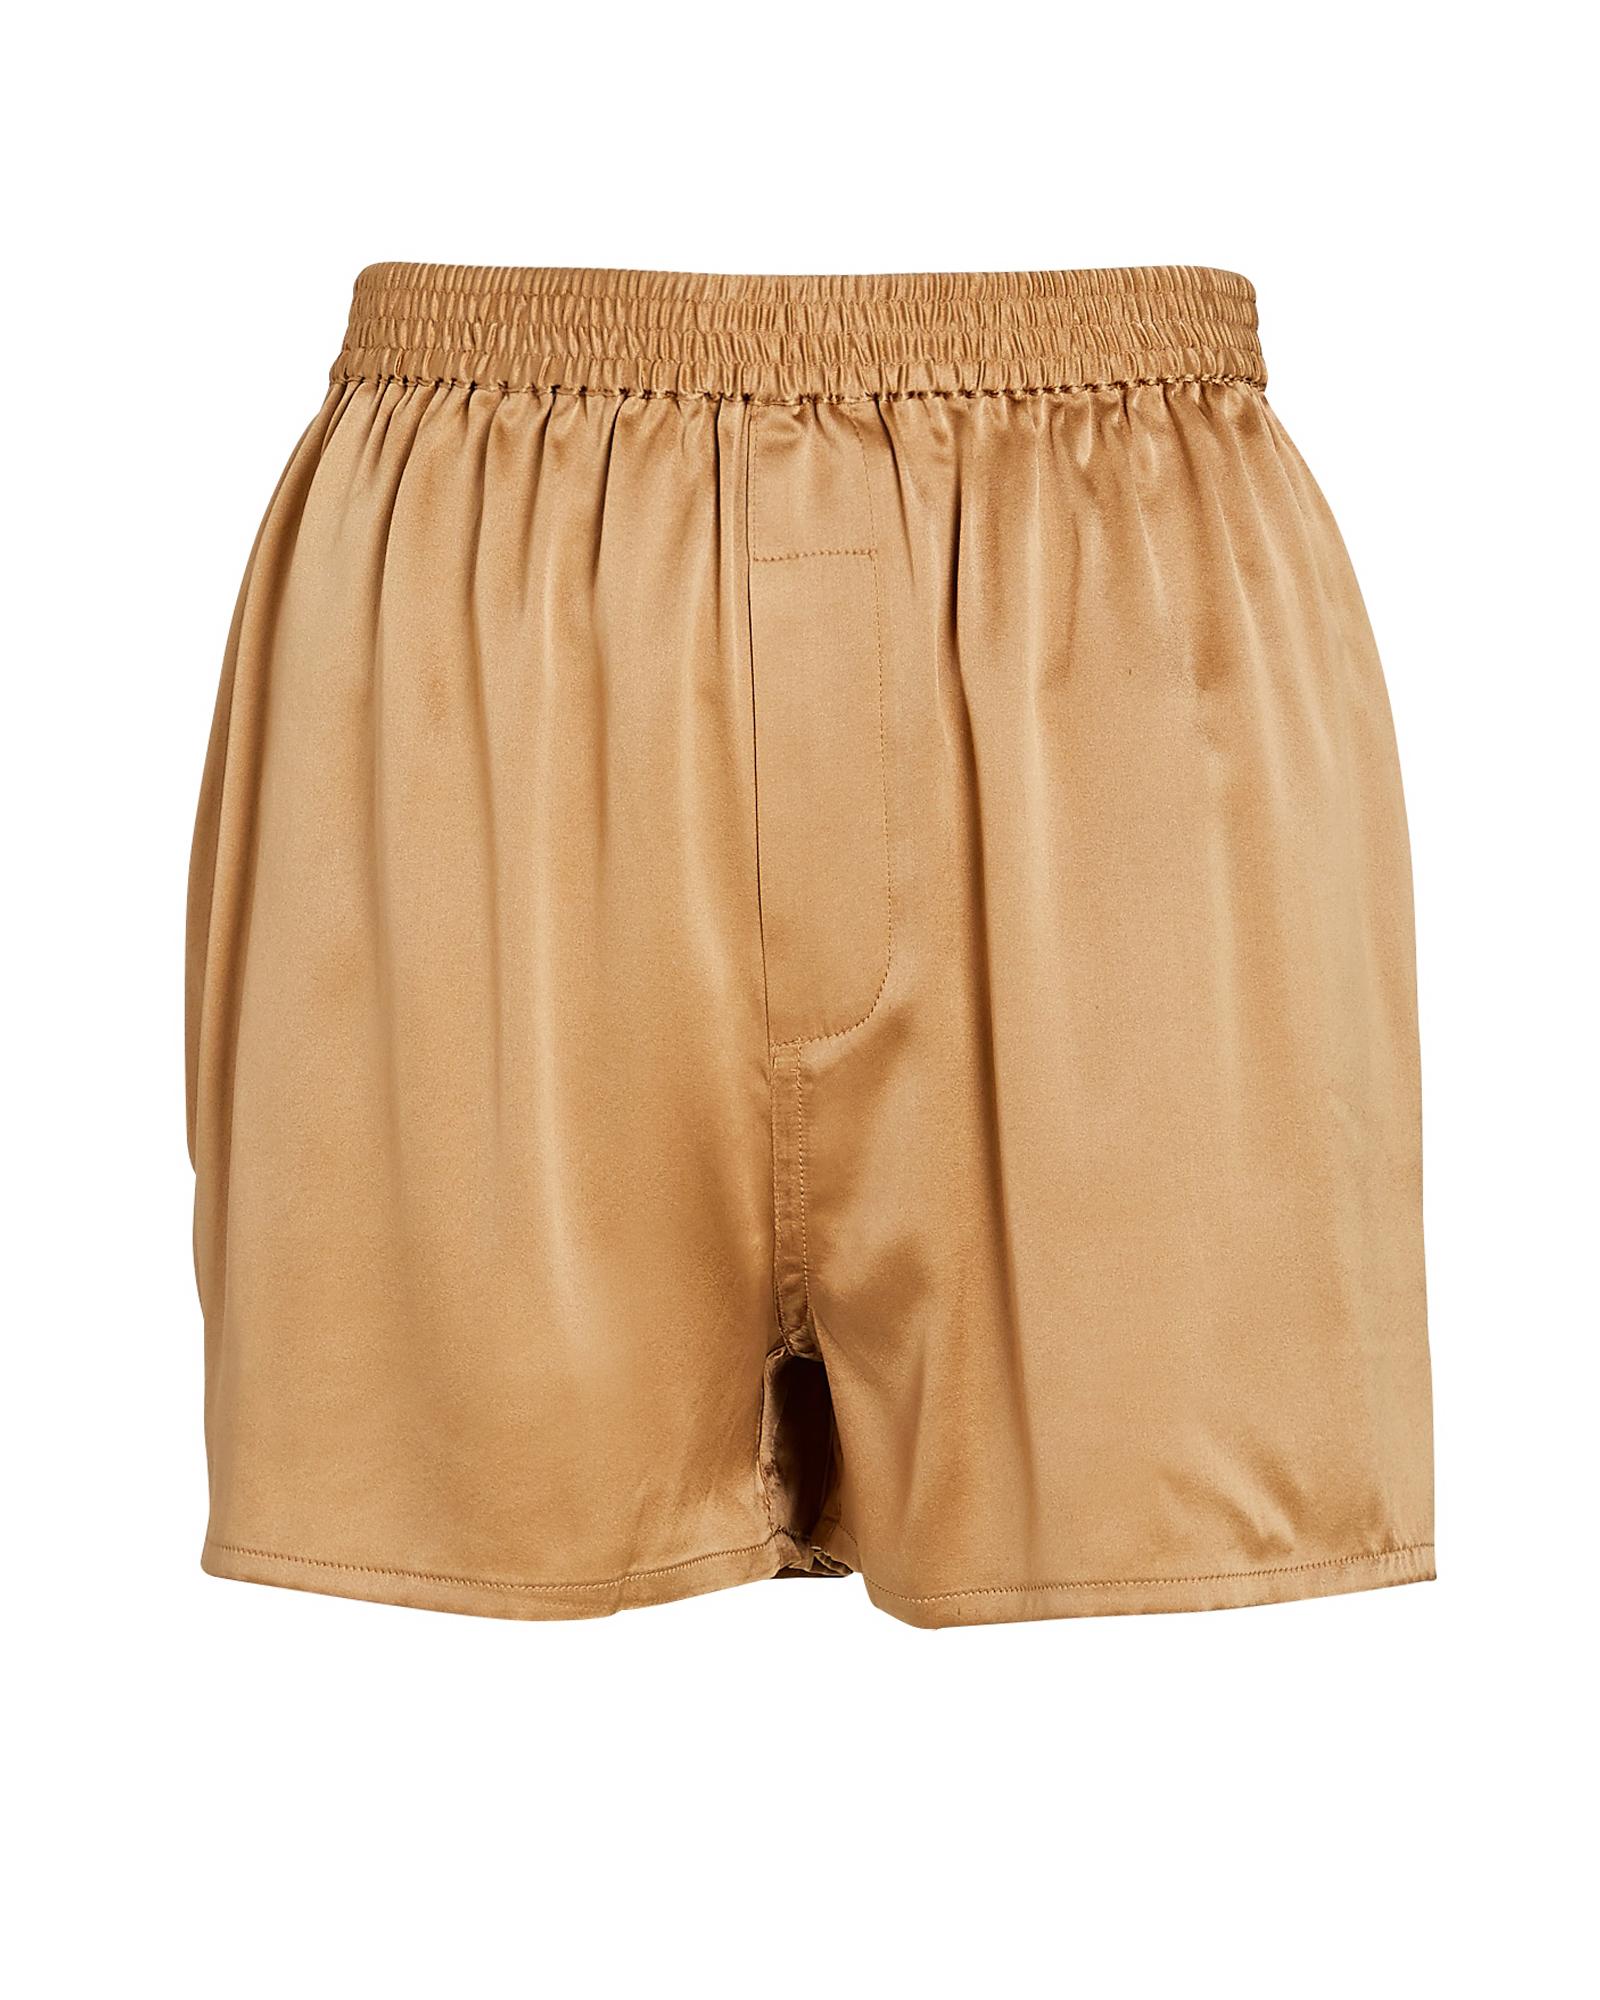 Frankies Bikinis Clothing Fifi Silk High-Rise Shorts